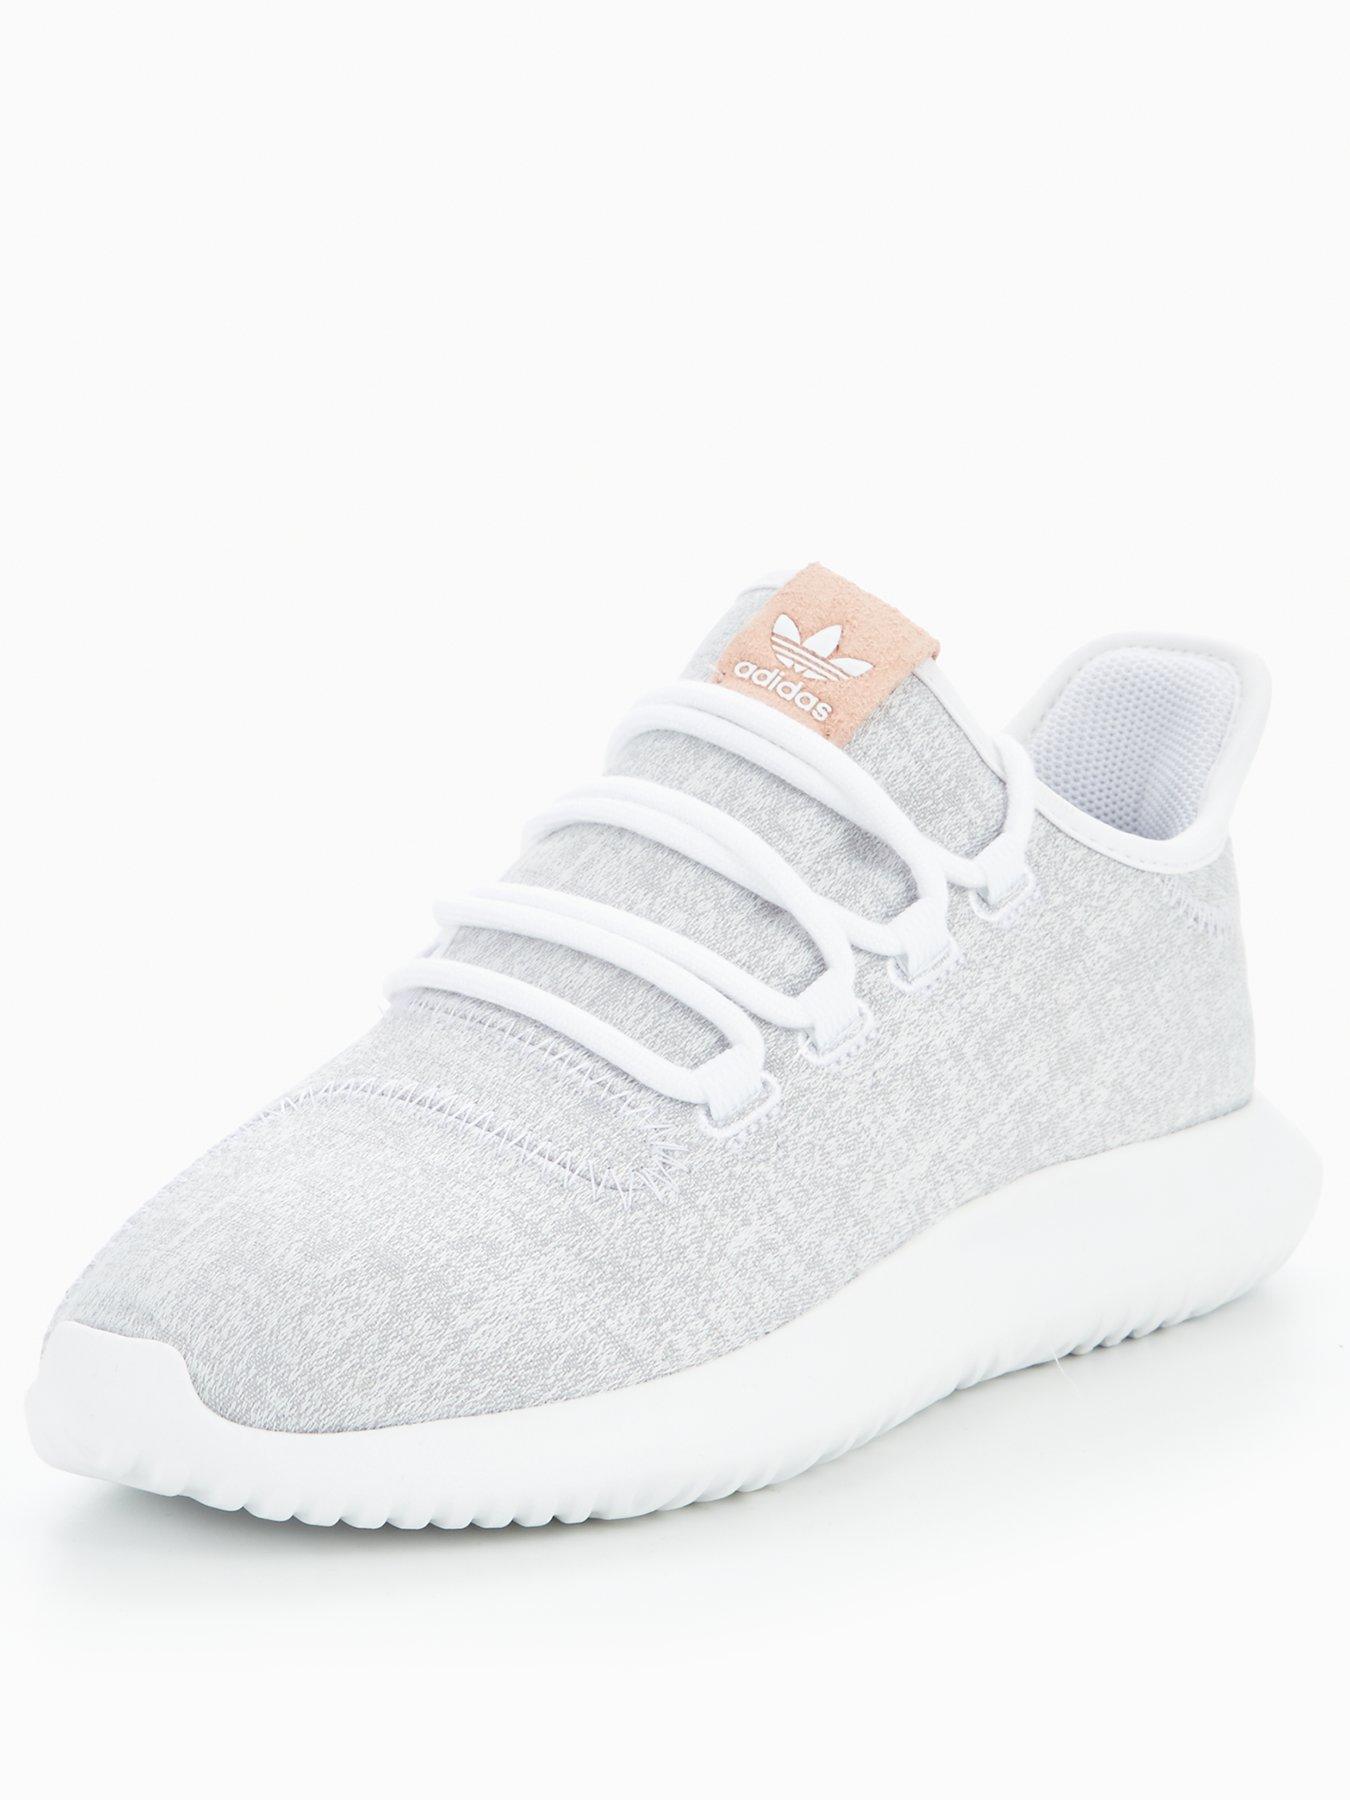 adidas originals tubular white